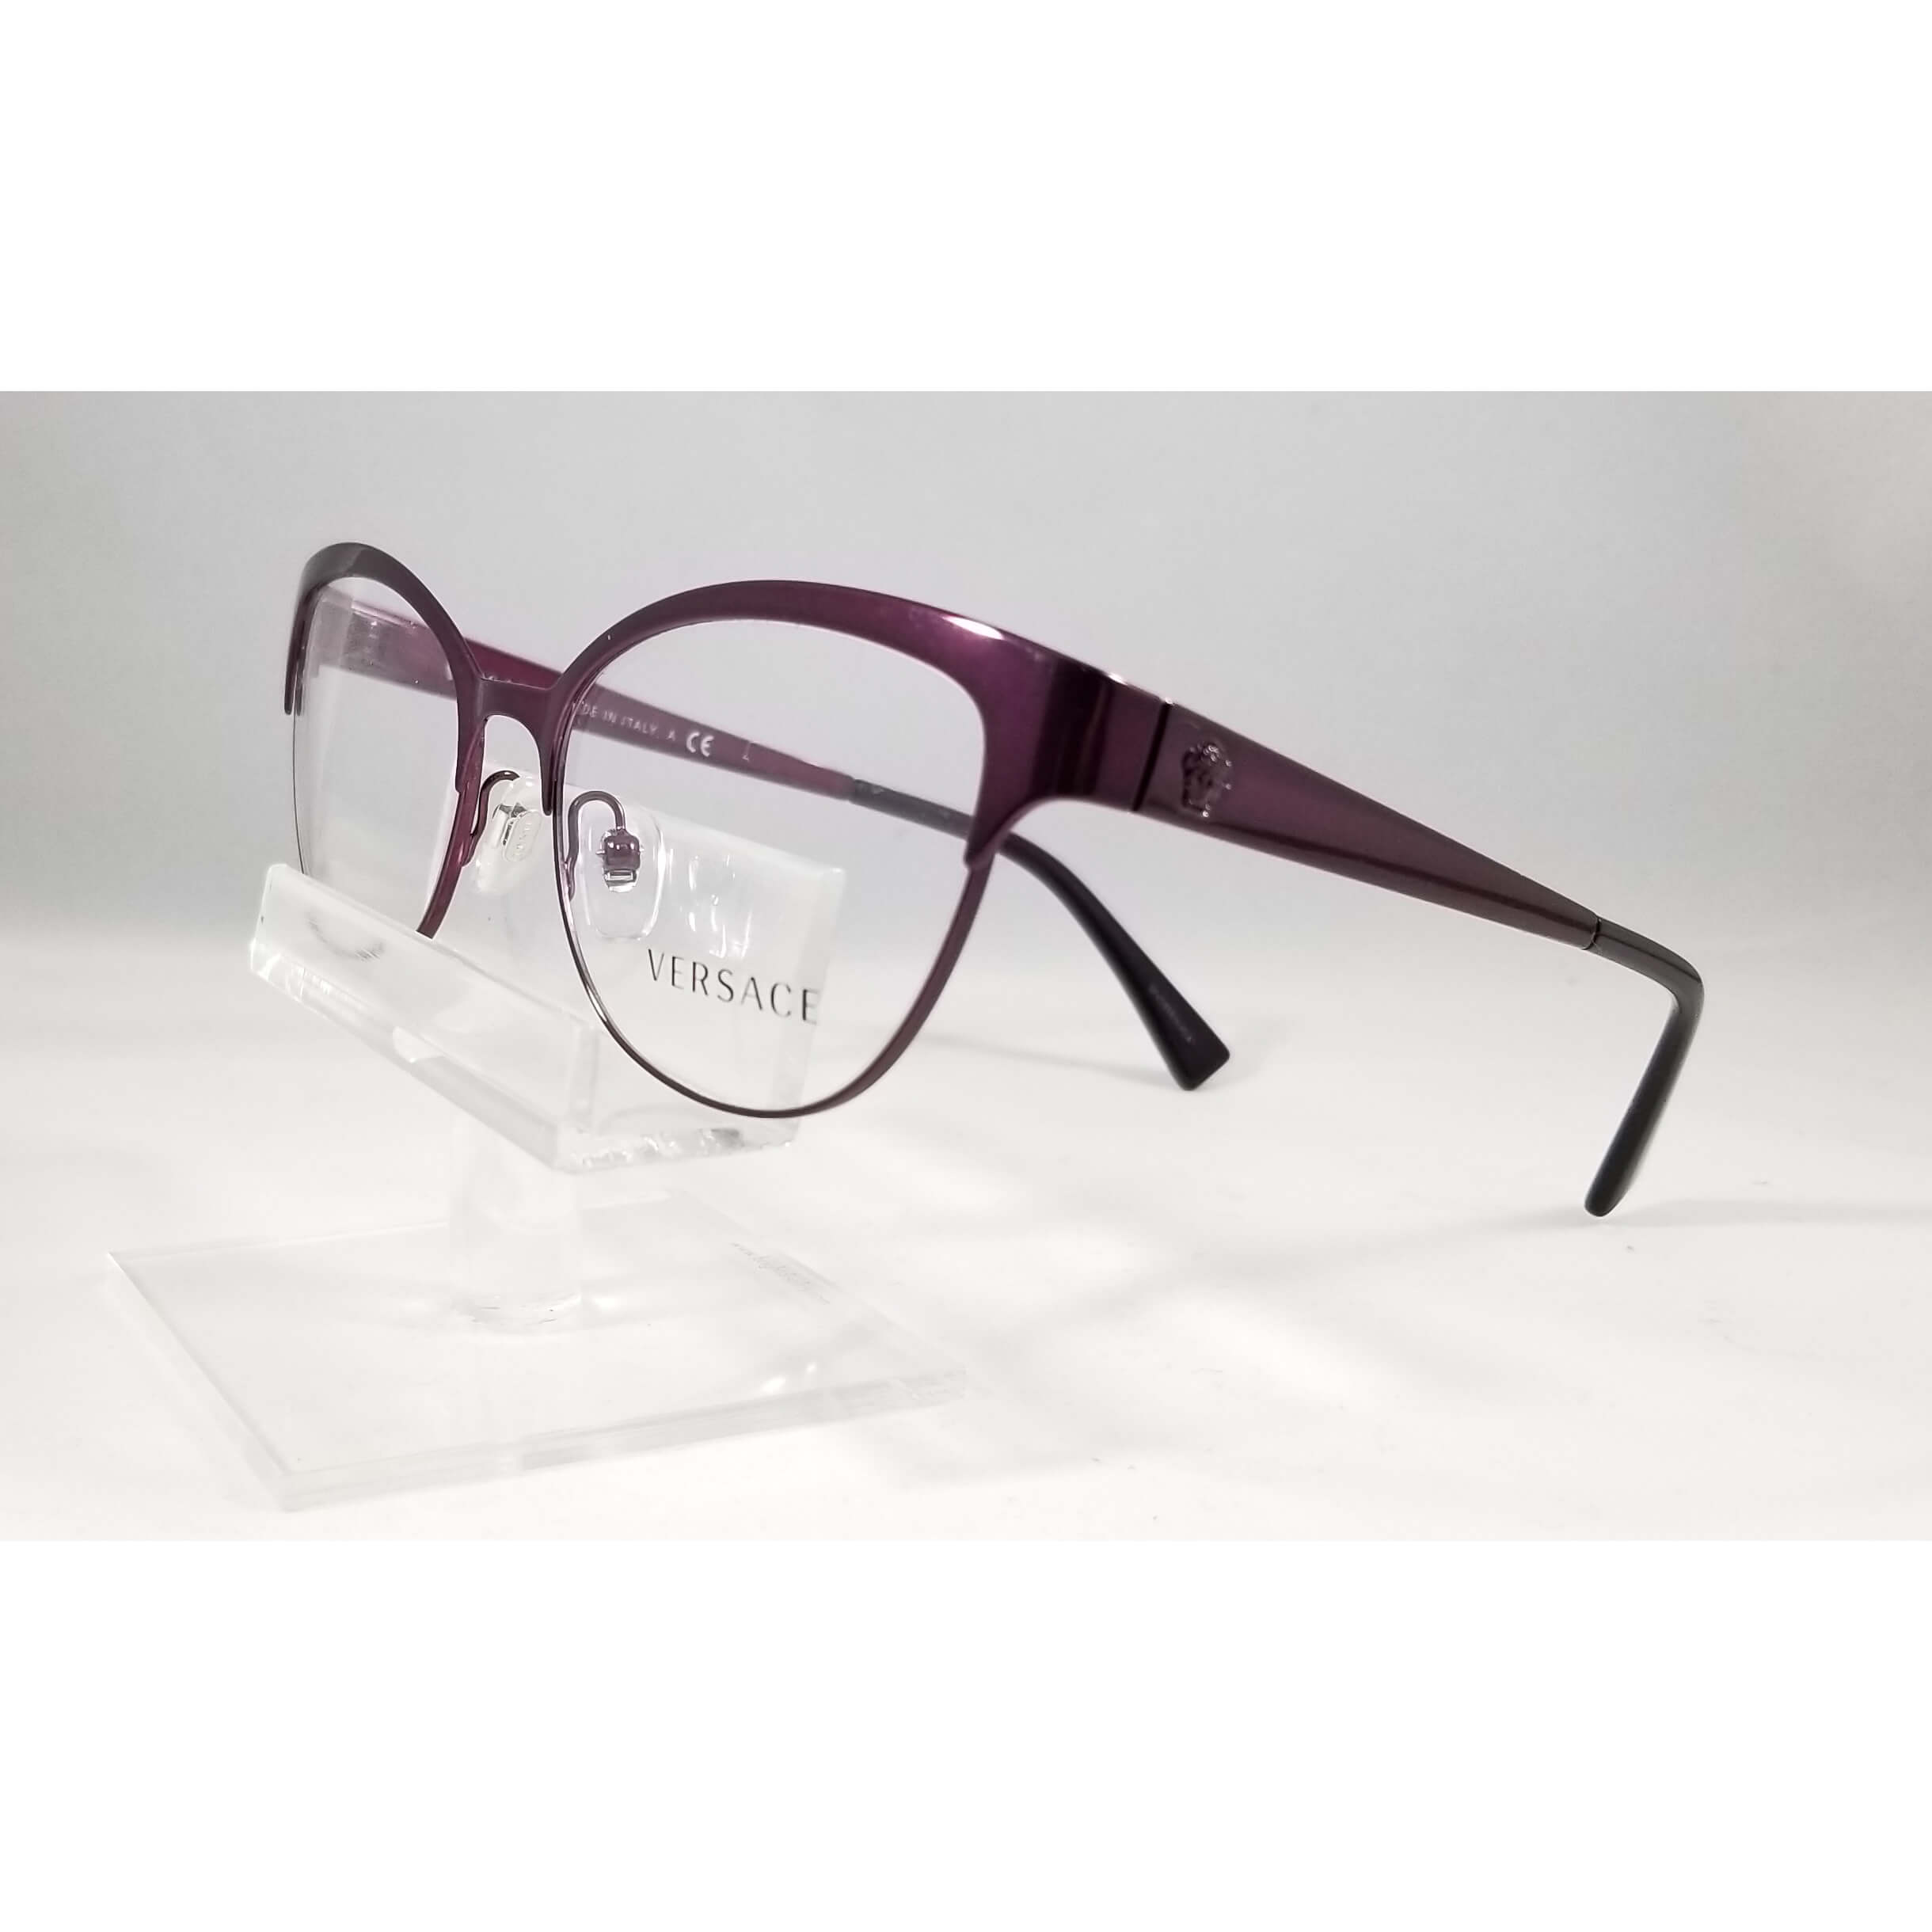 1e2db5ae42cd versace 1240 1397 2 - See My Glasses